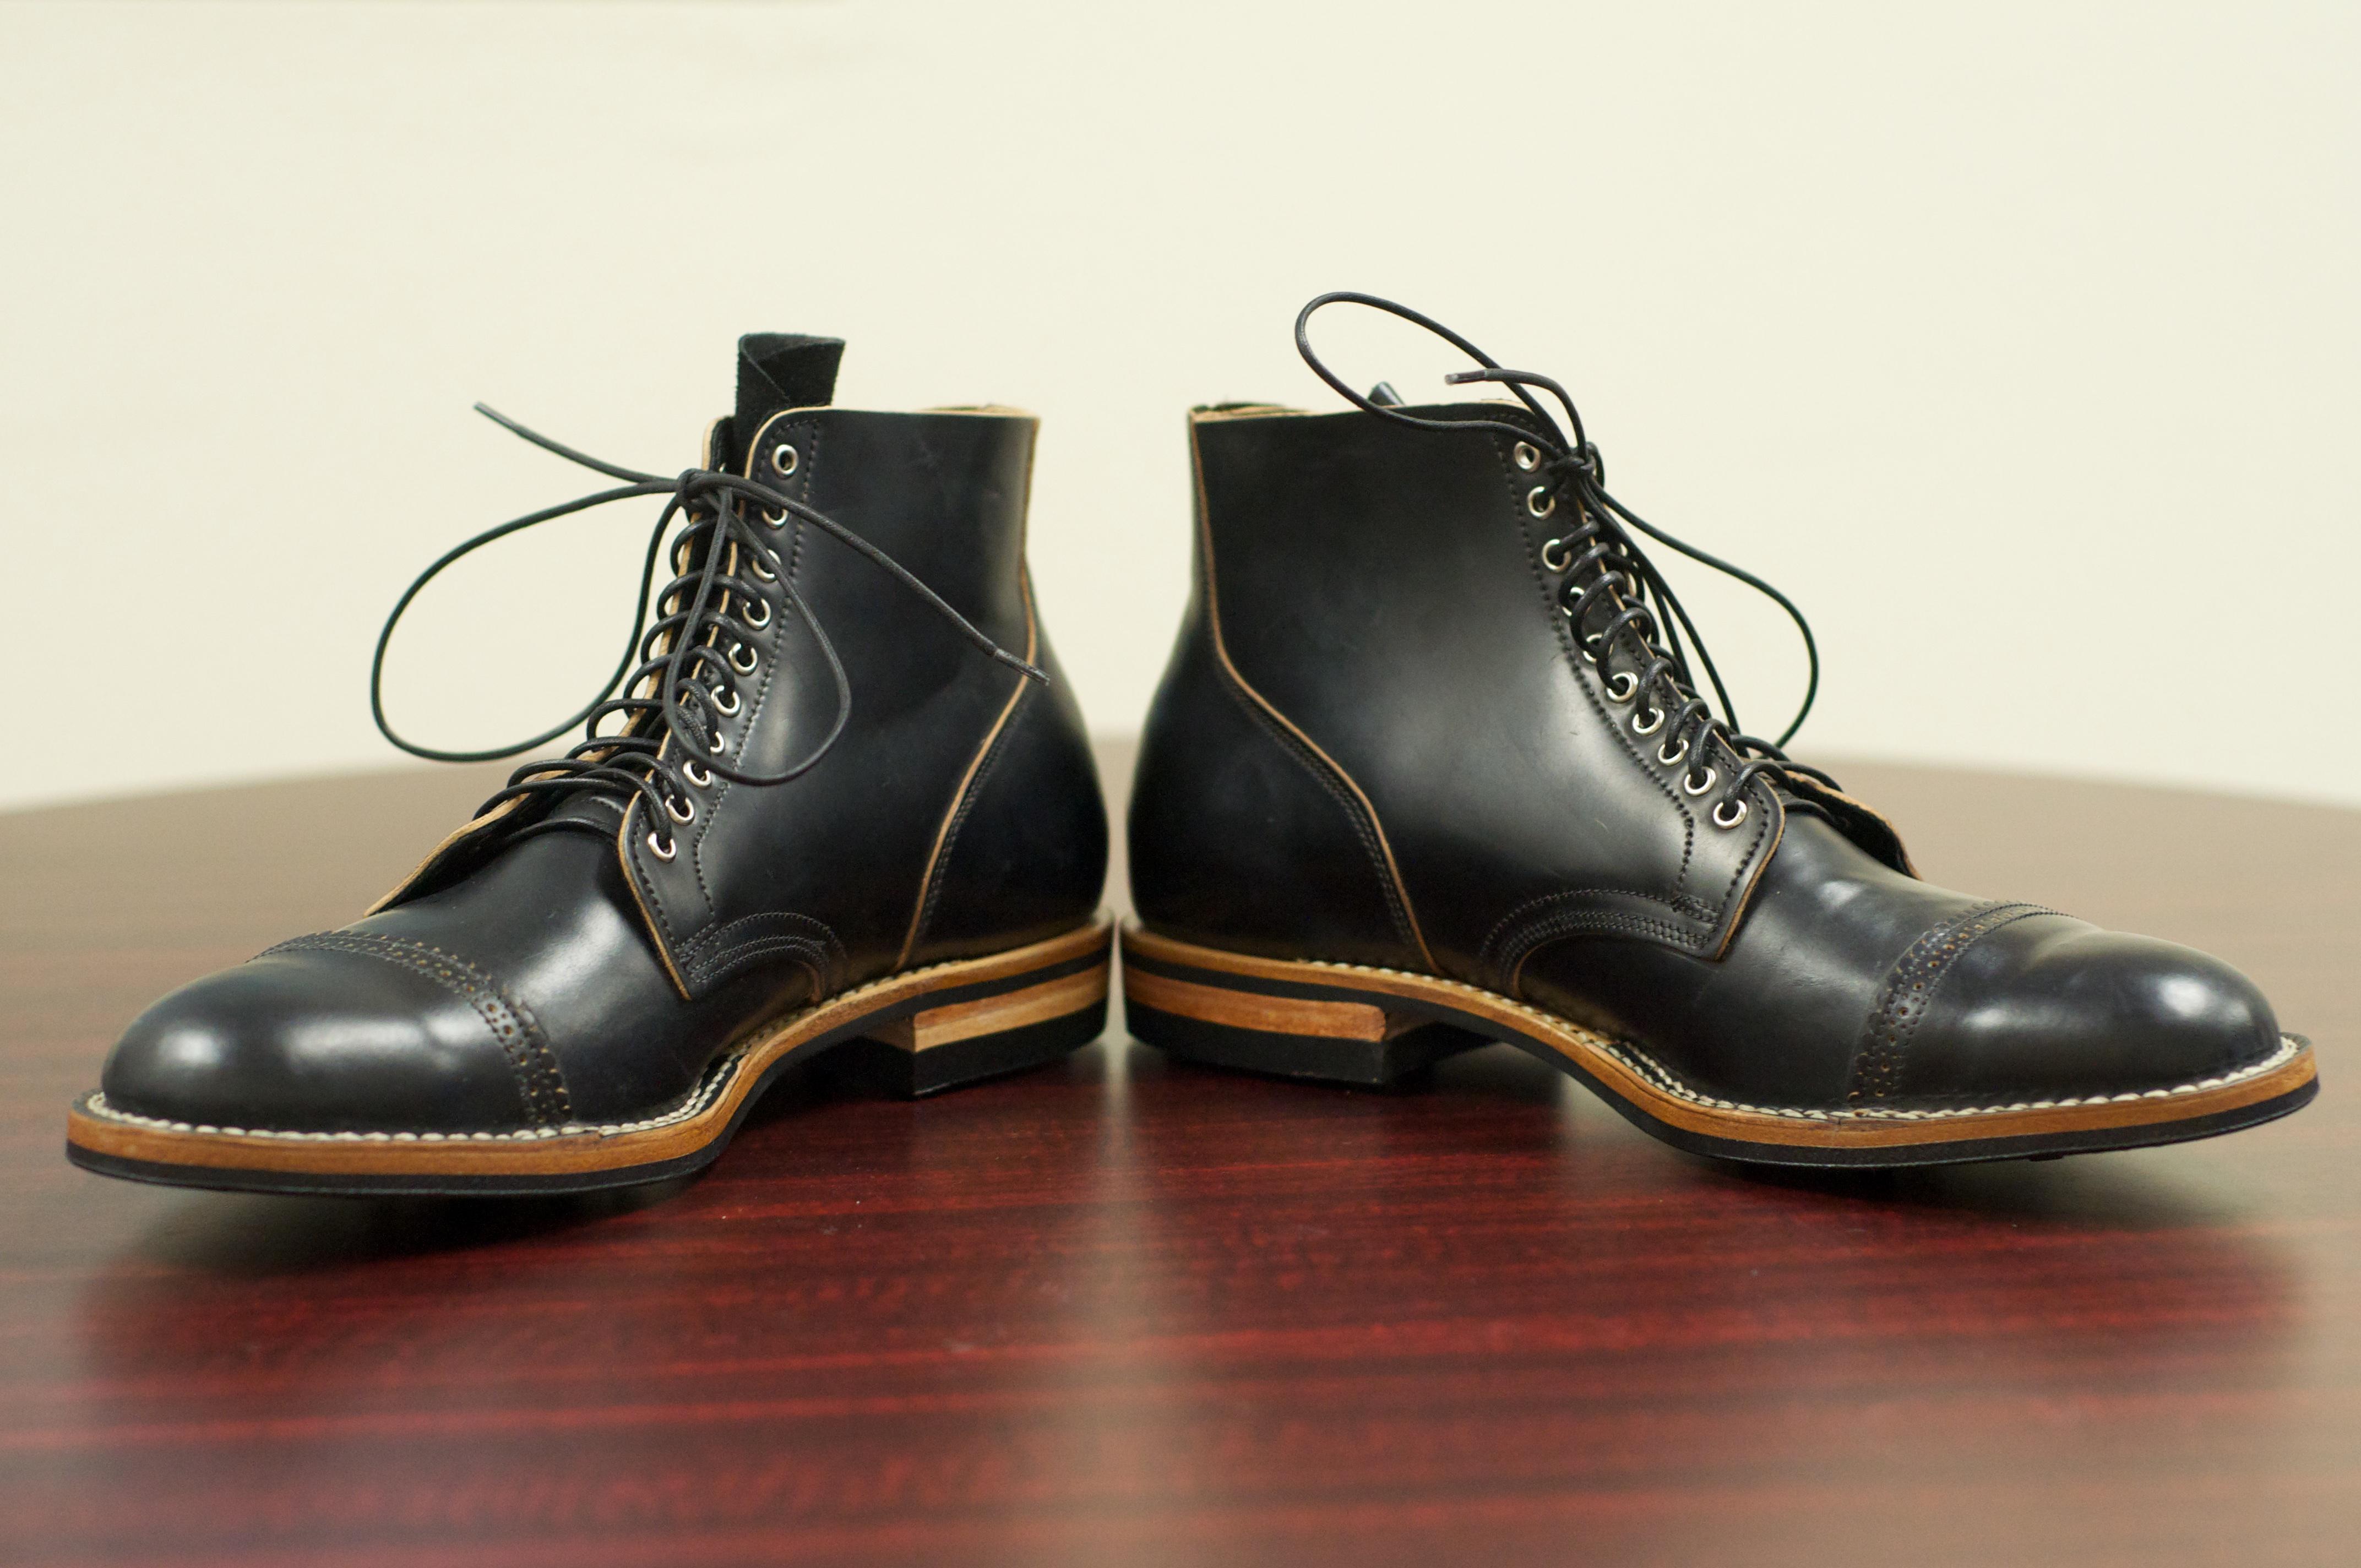 SOLD: Viberg Boots in Black Shell Cordovan – 10.5D – Alden ...